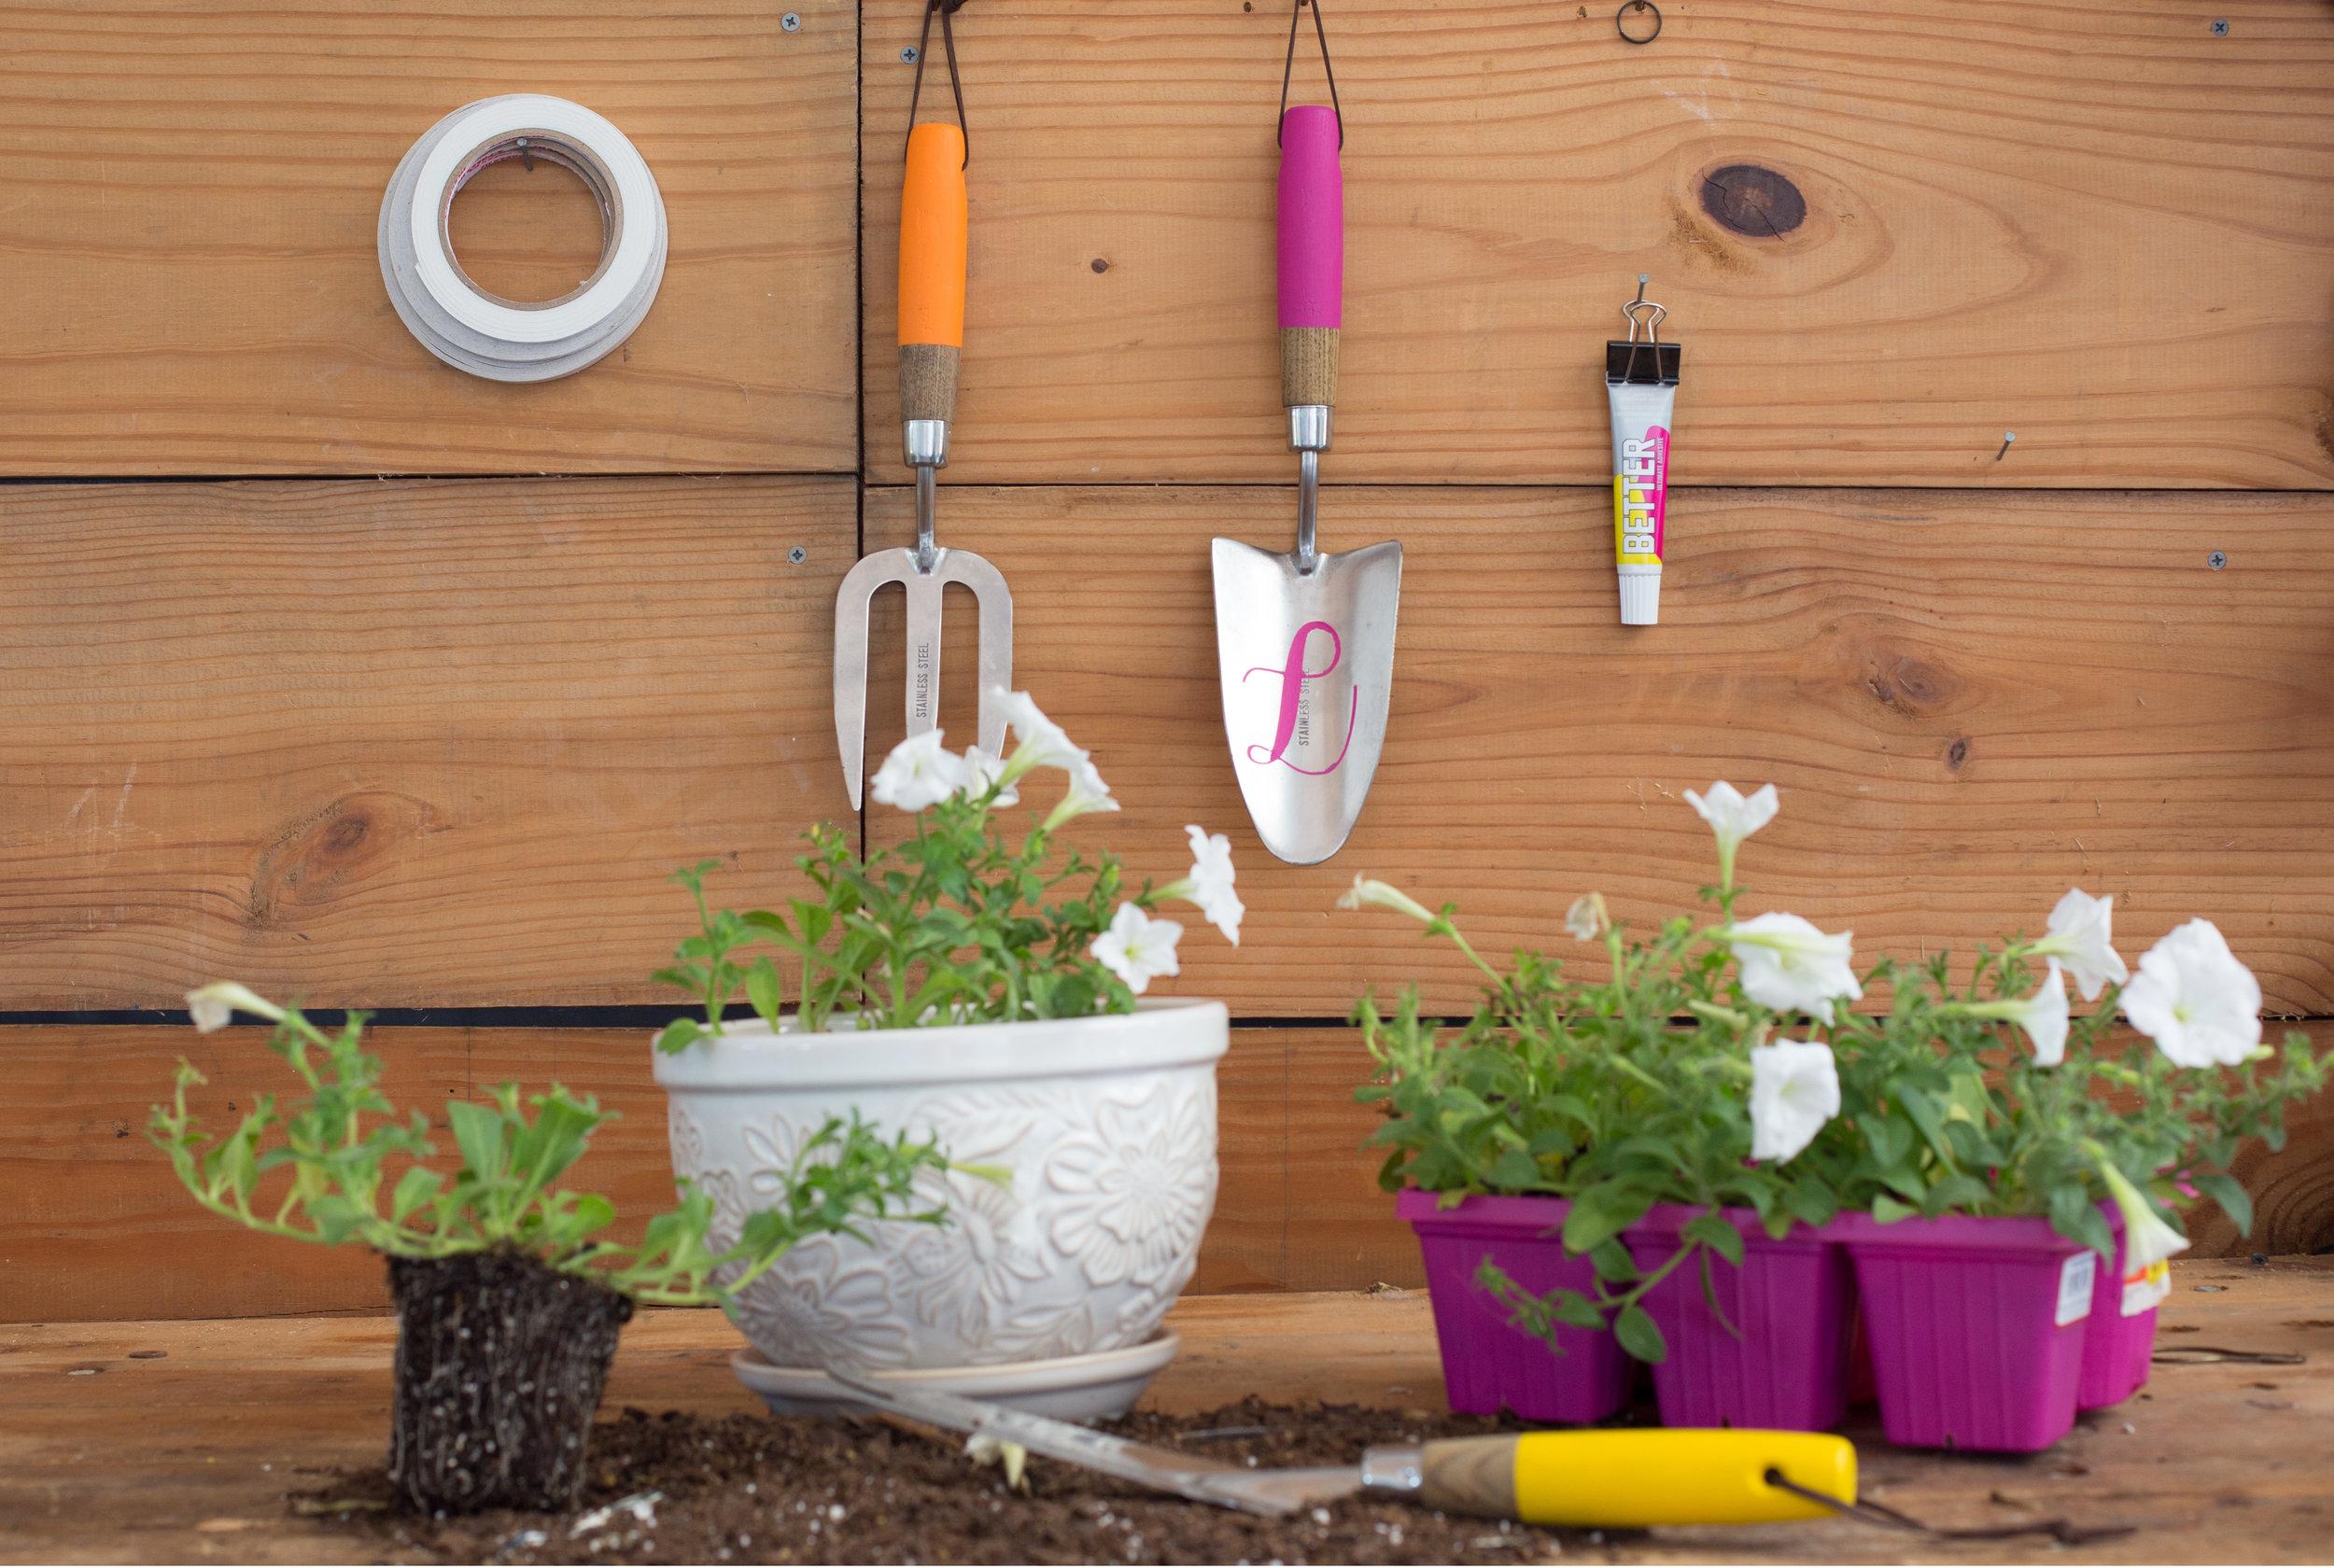 DIY Custom Colored Garden Tools 1